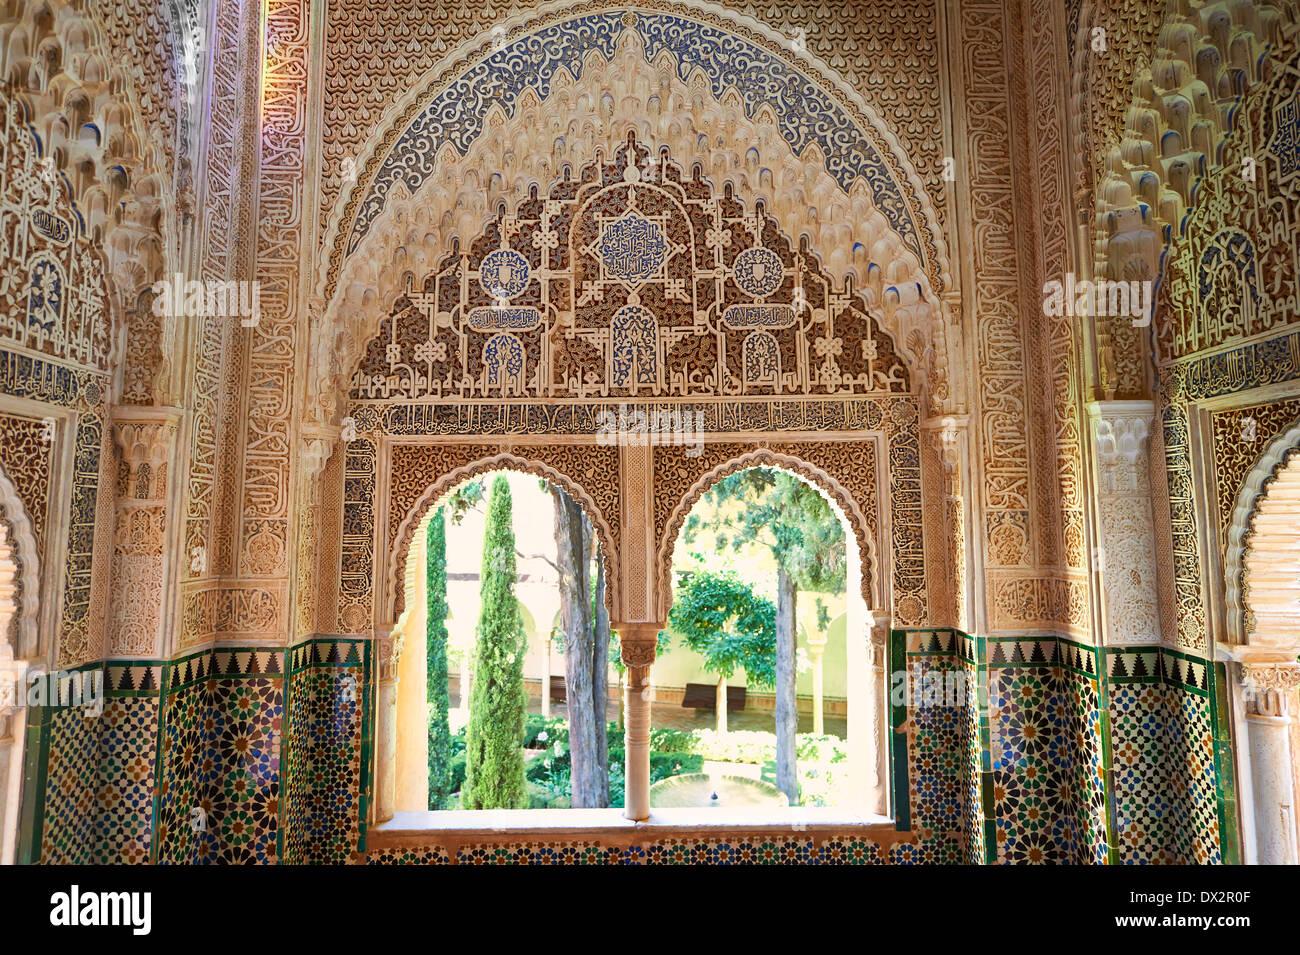 Arabesco estalactitas morcabe morisca o la arquitectura de los Palacios Nazaries, Alhambra. Granada, Andalucía, Imagen De Stock